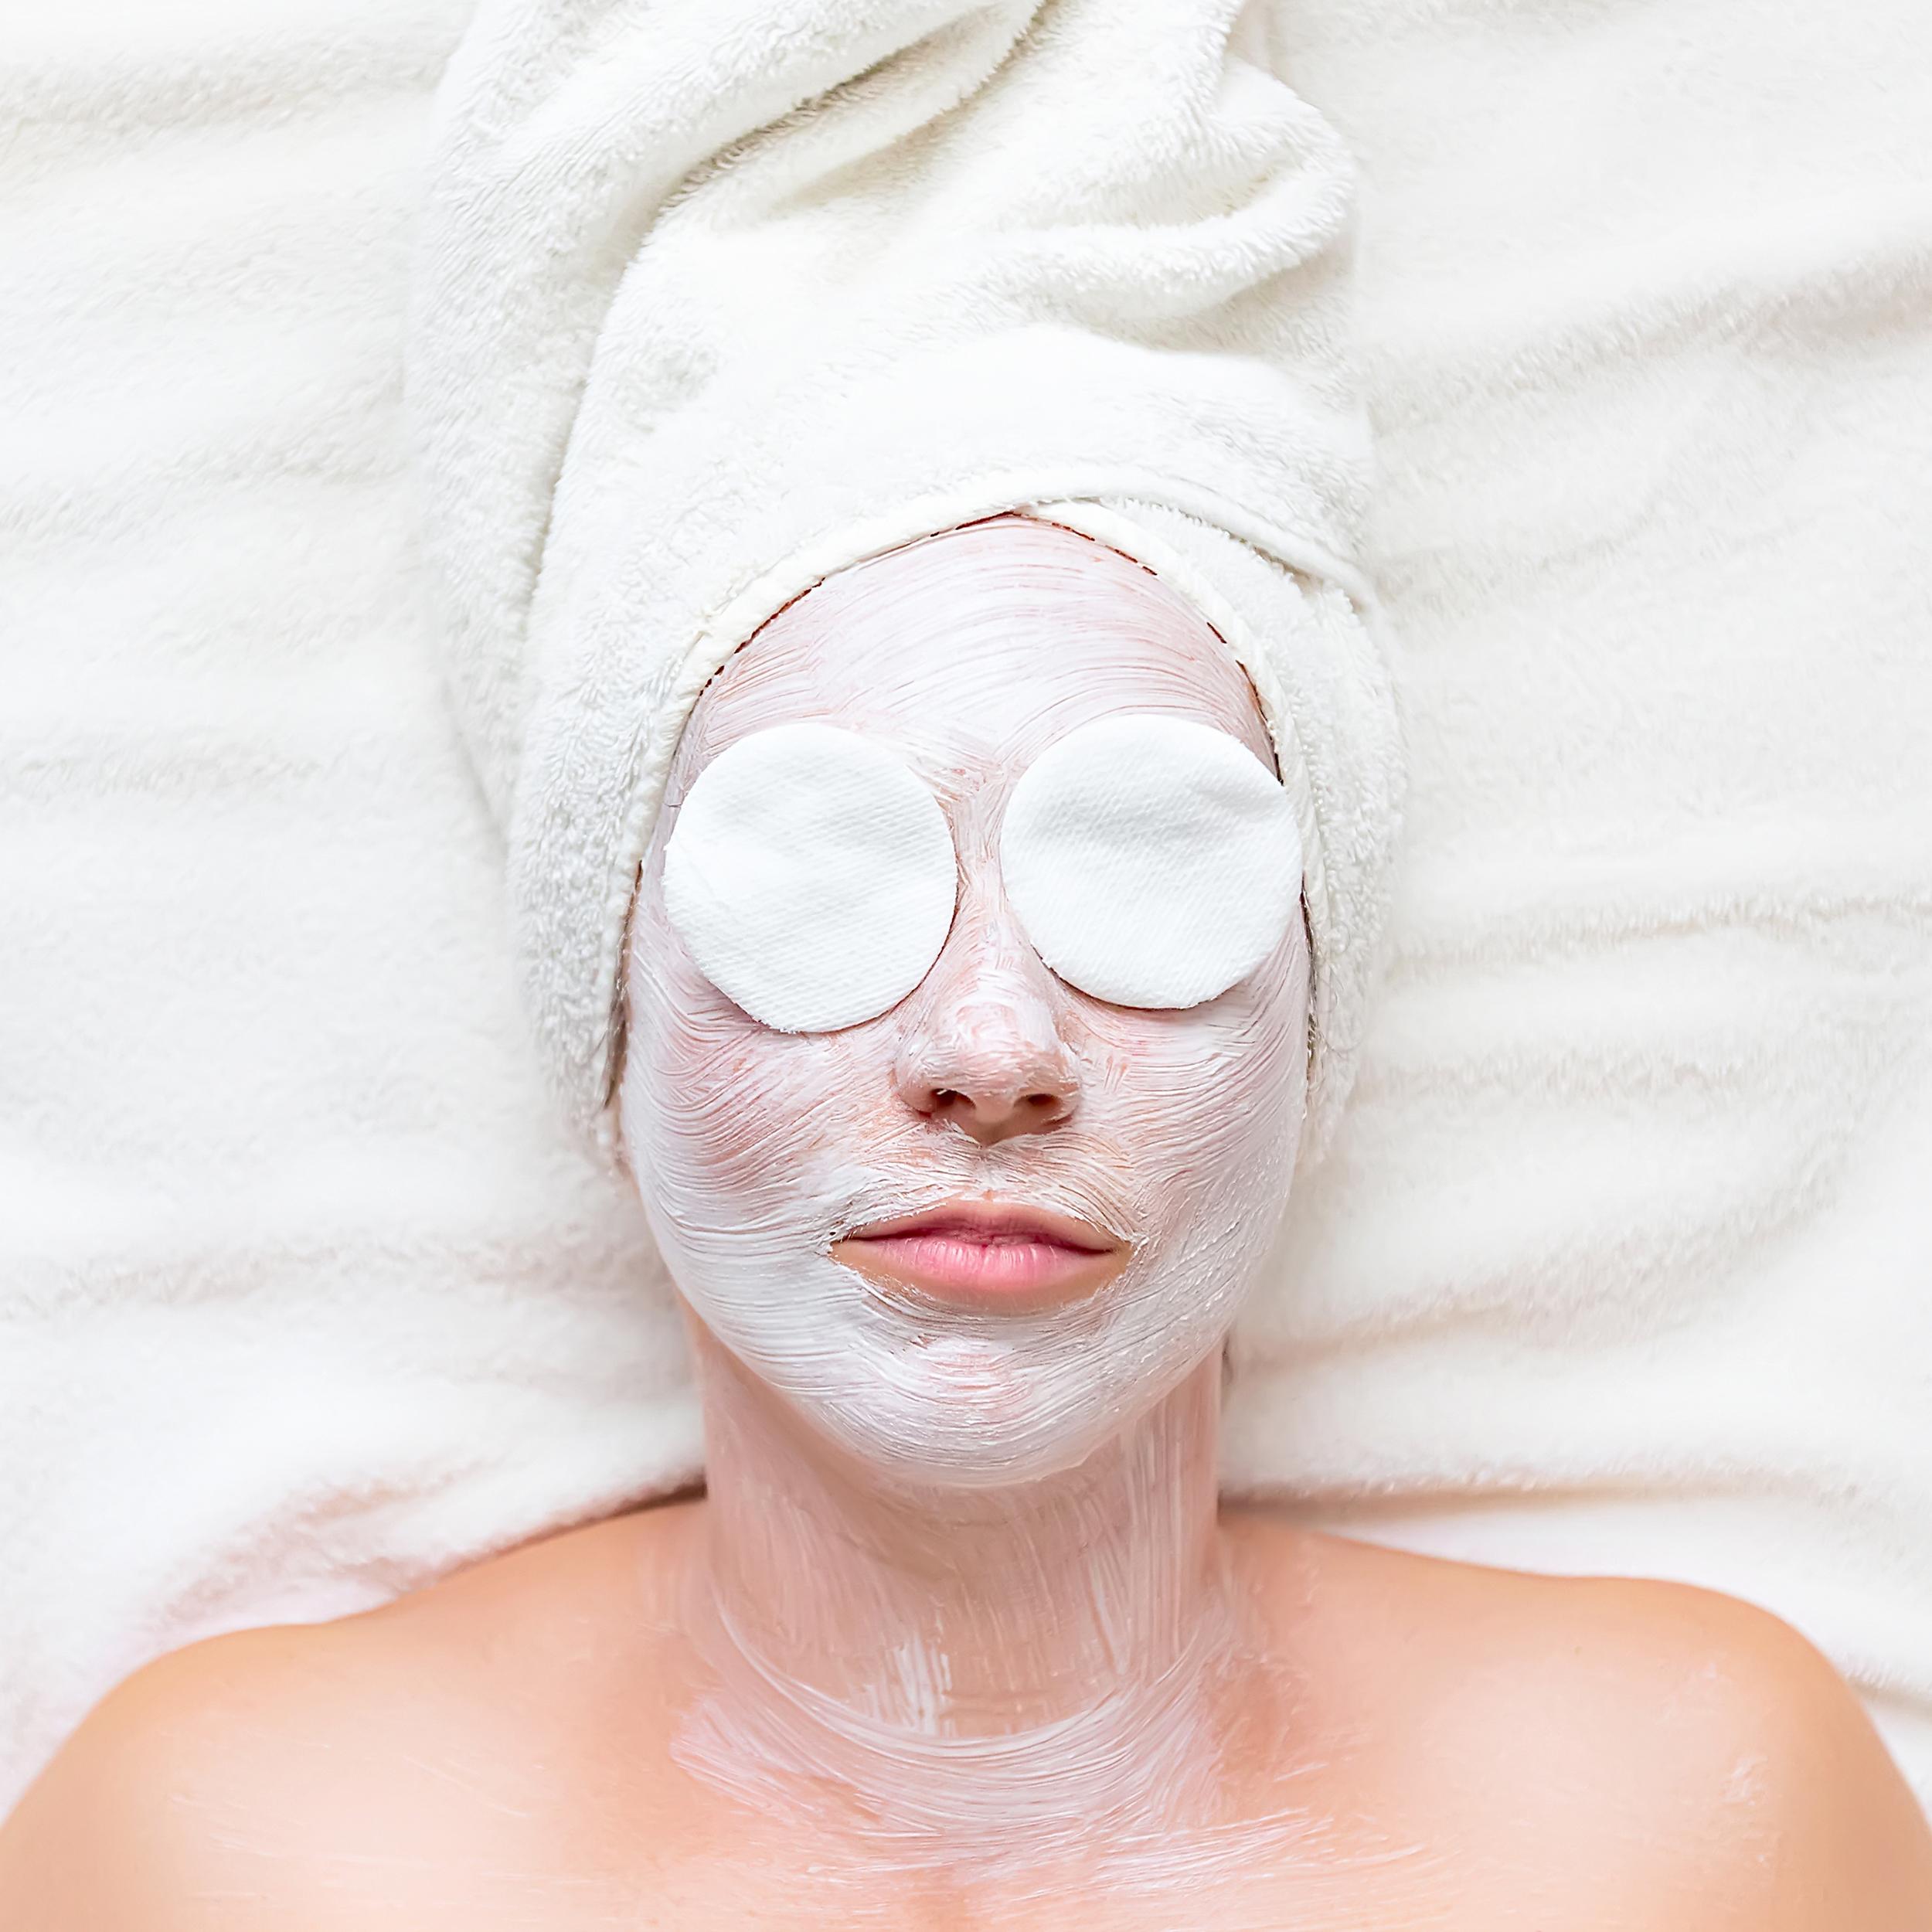 My Updated Skincare Routine 2020